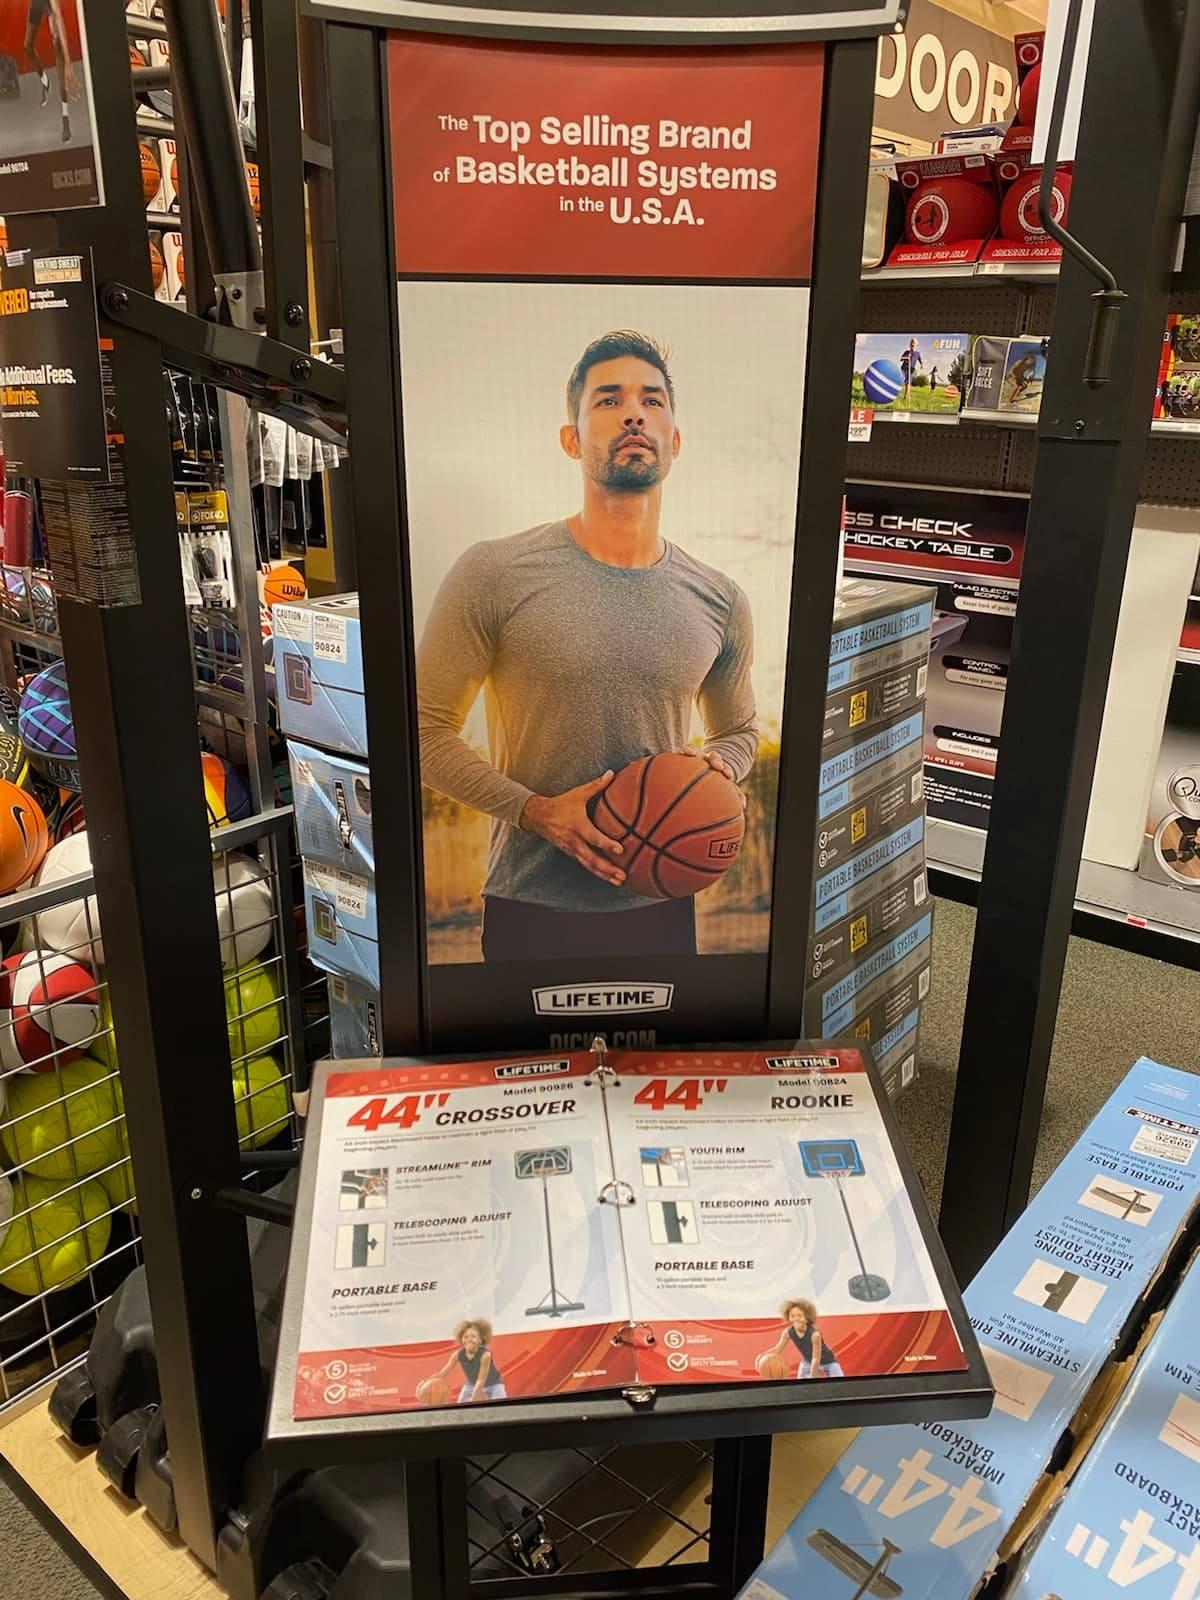 Basketball For Lifetime in Dick's Sporting Goods